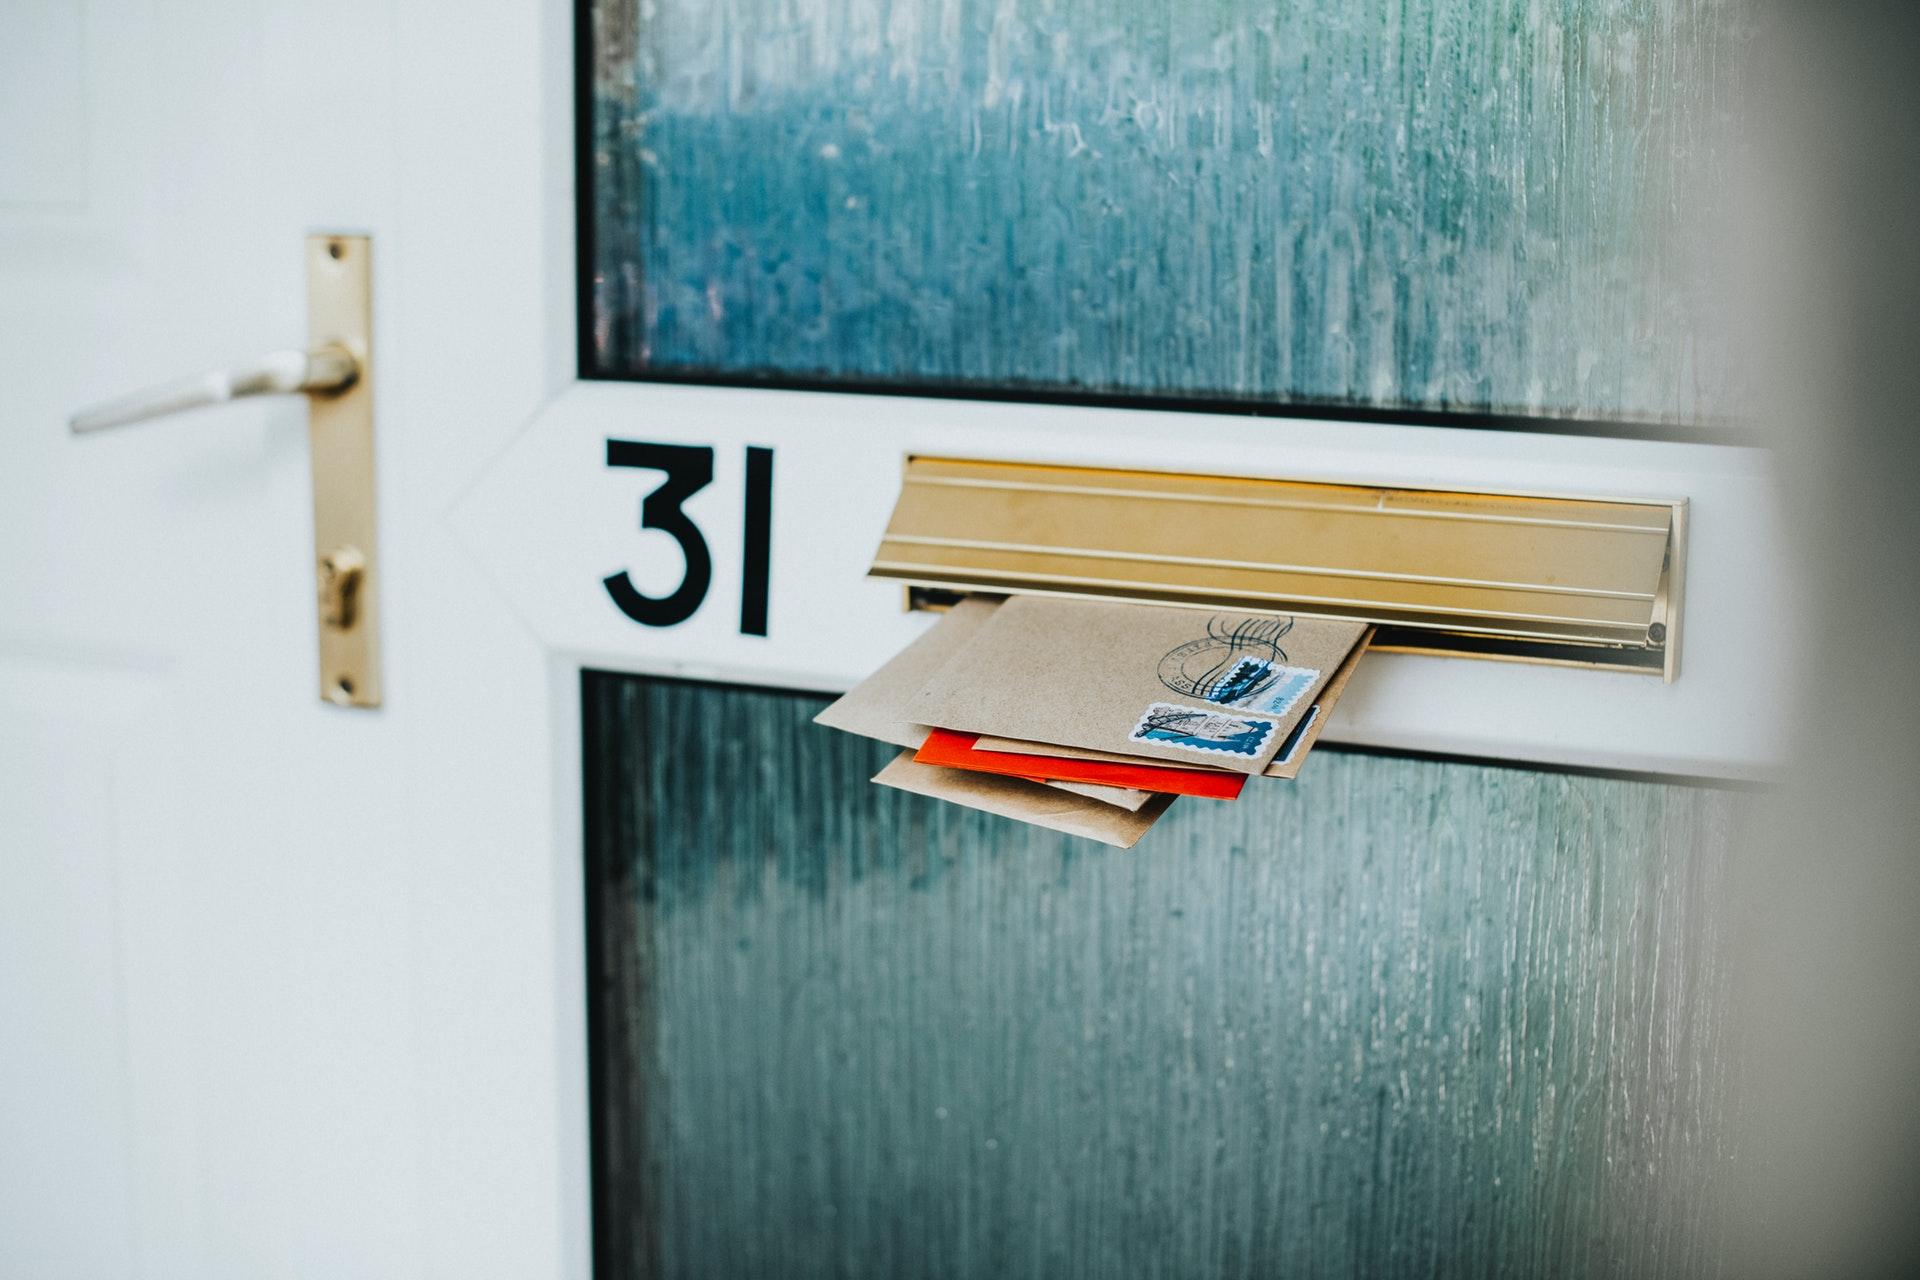 Envelopes stuffed into a mailbox